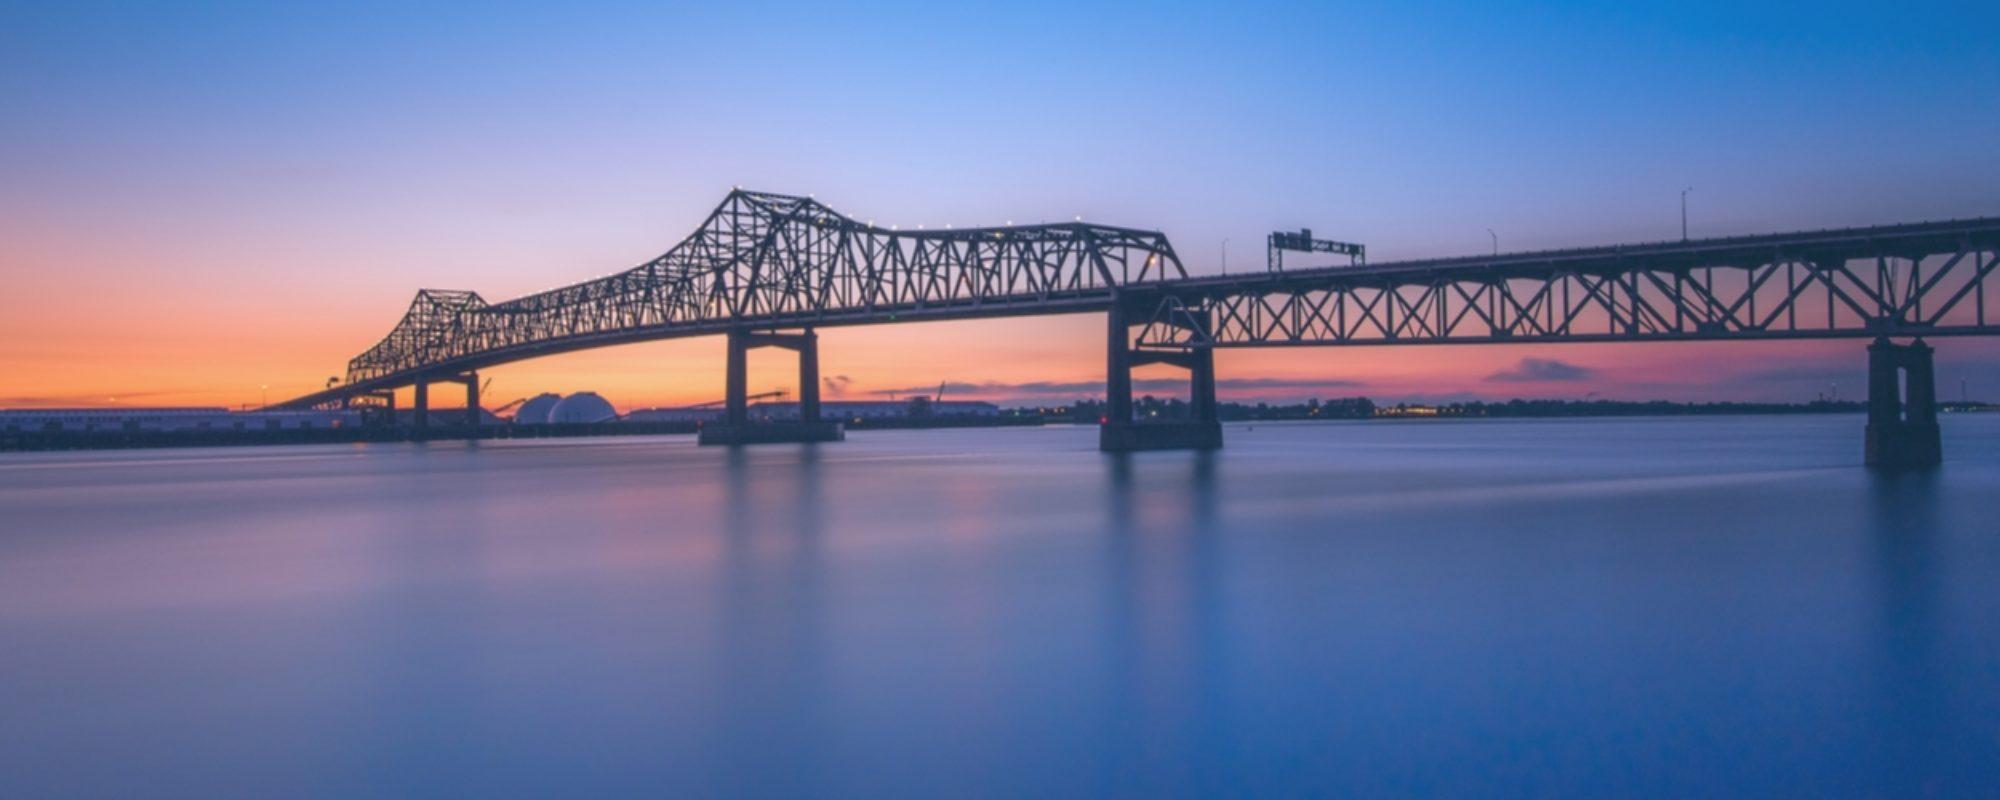 Mississippi Bridge  Downtown Baton Rouge Louisiana